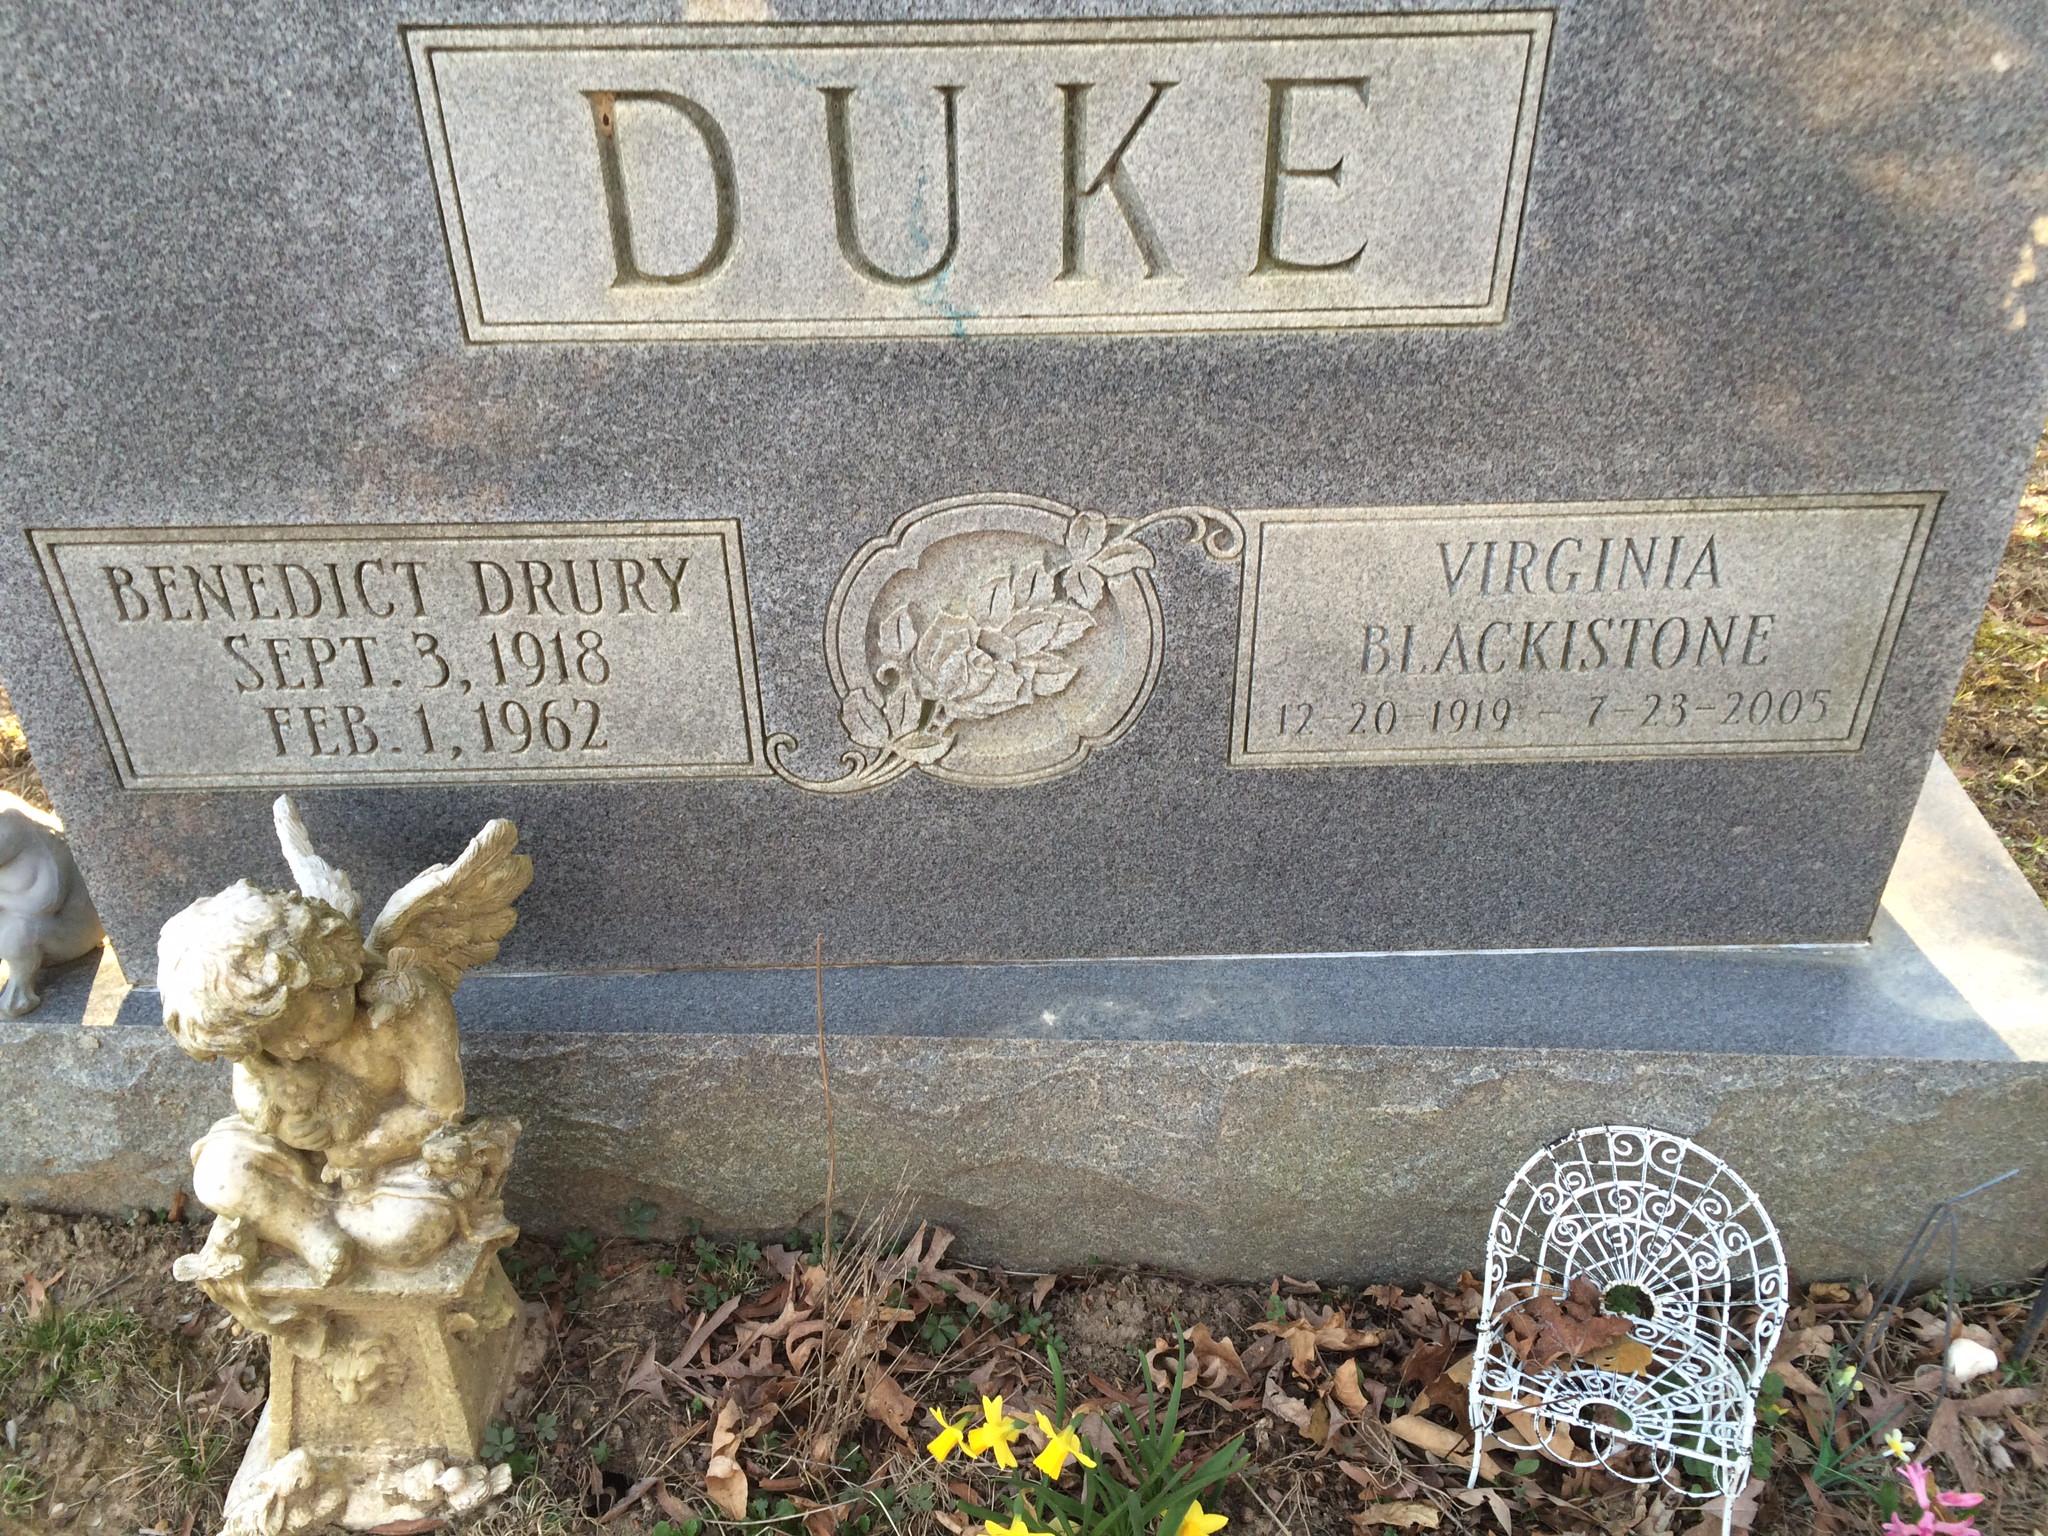 Benedict Drury Duke